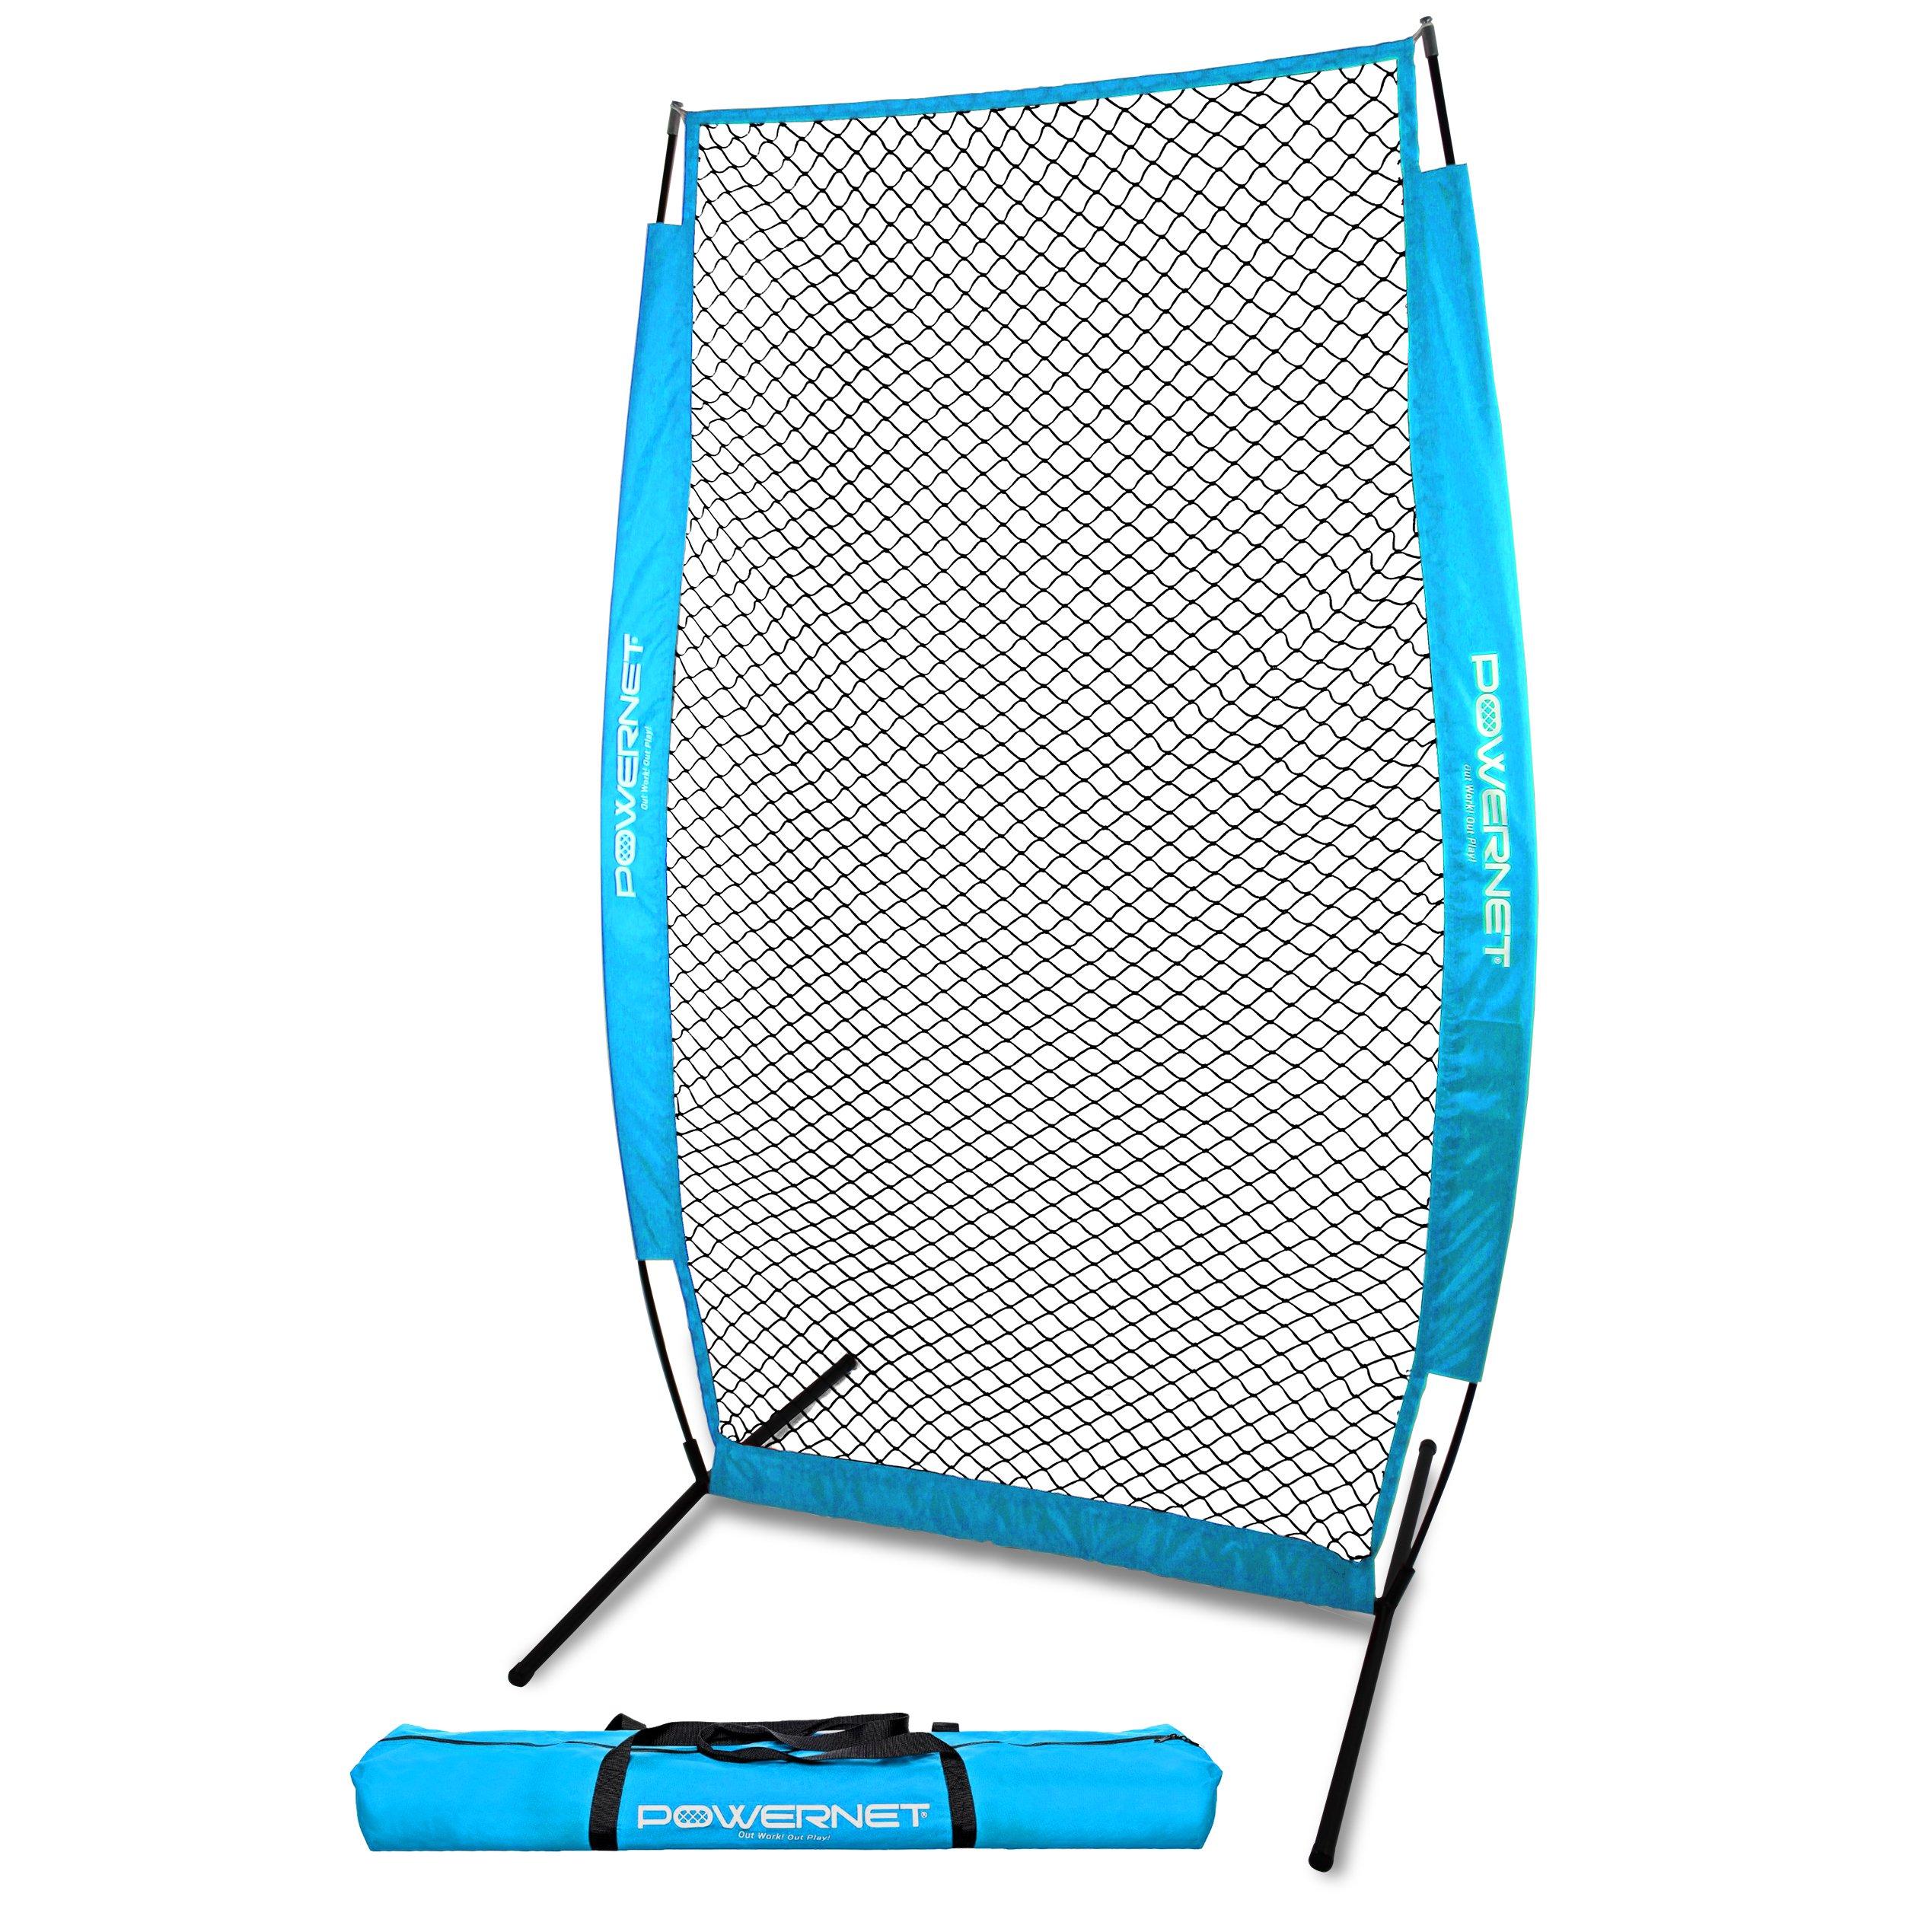 PowerNet I-Screen with Frame and Carry Bag (Sky Blue)